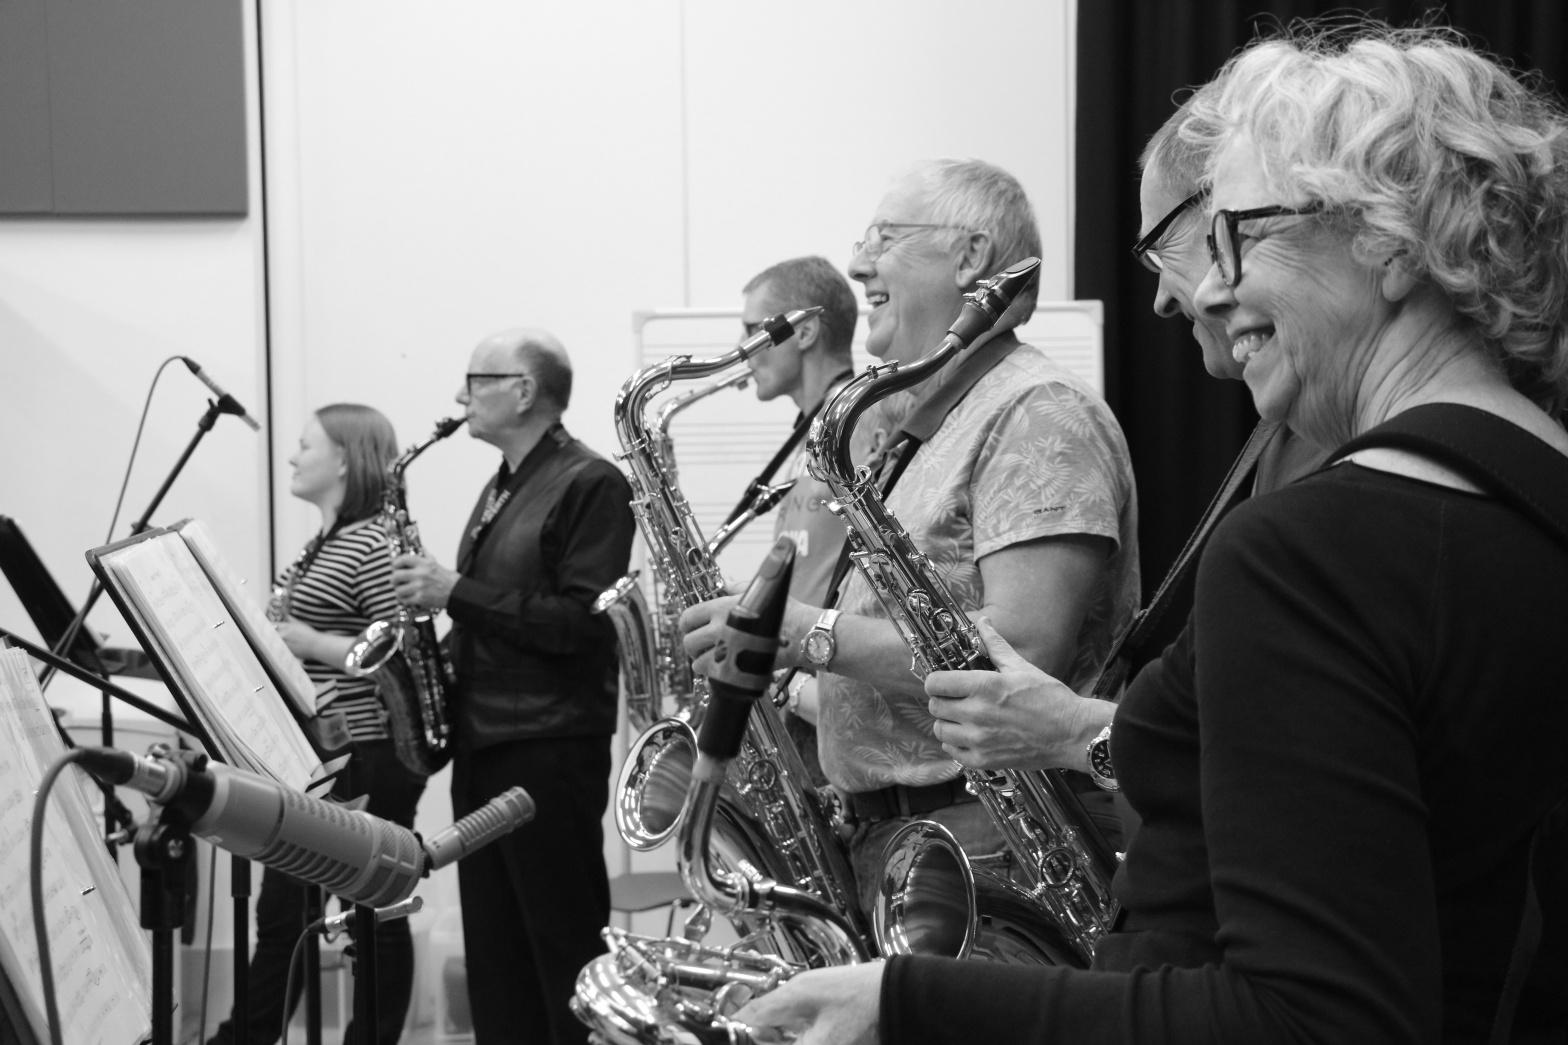 Guiseley Jazz band - recording session